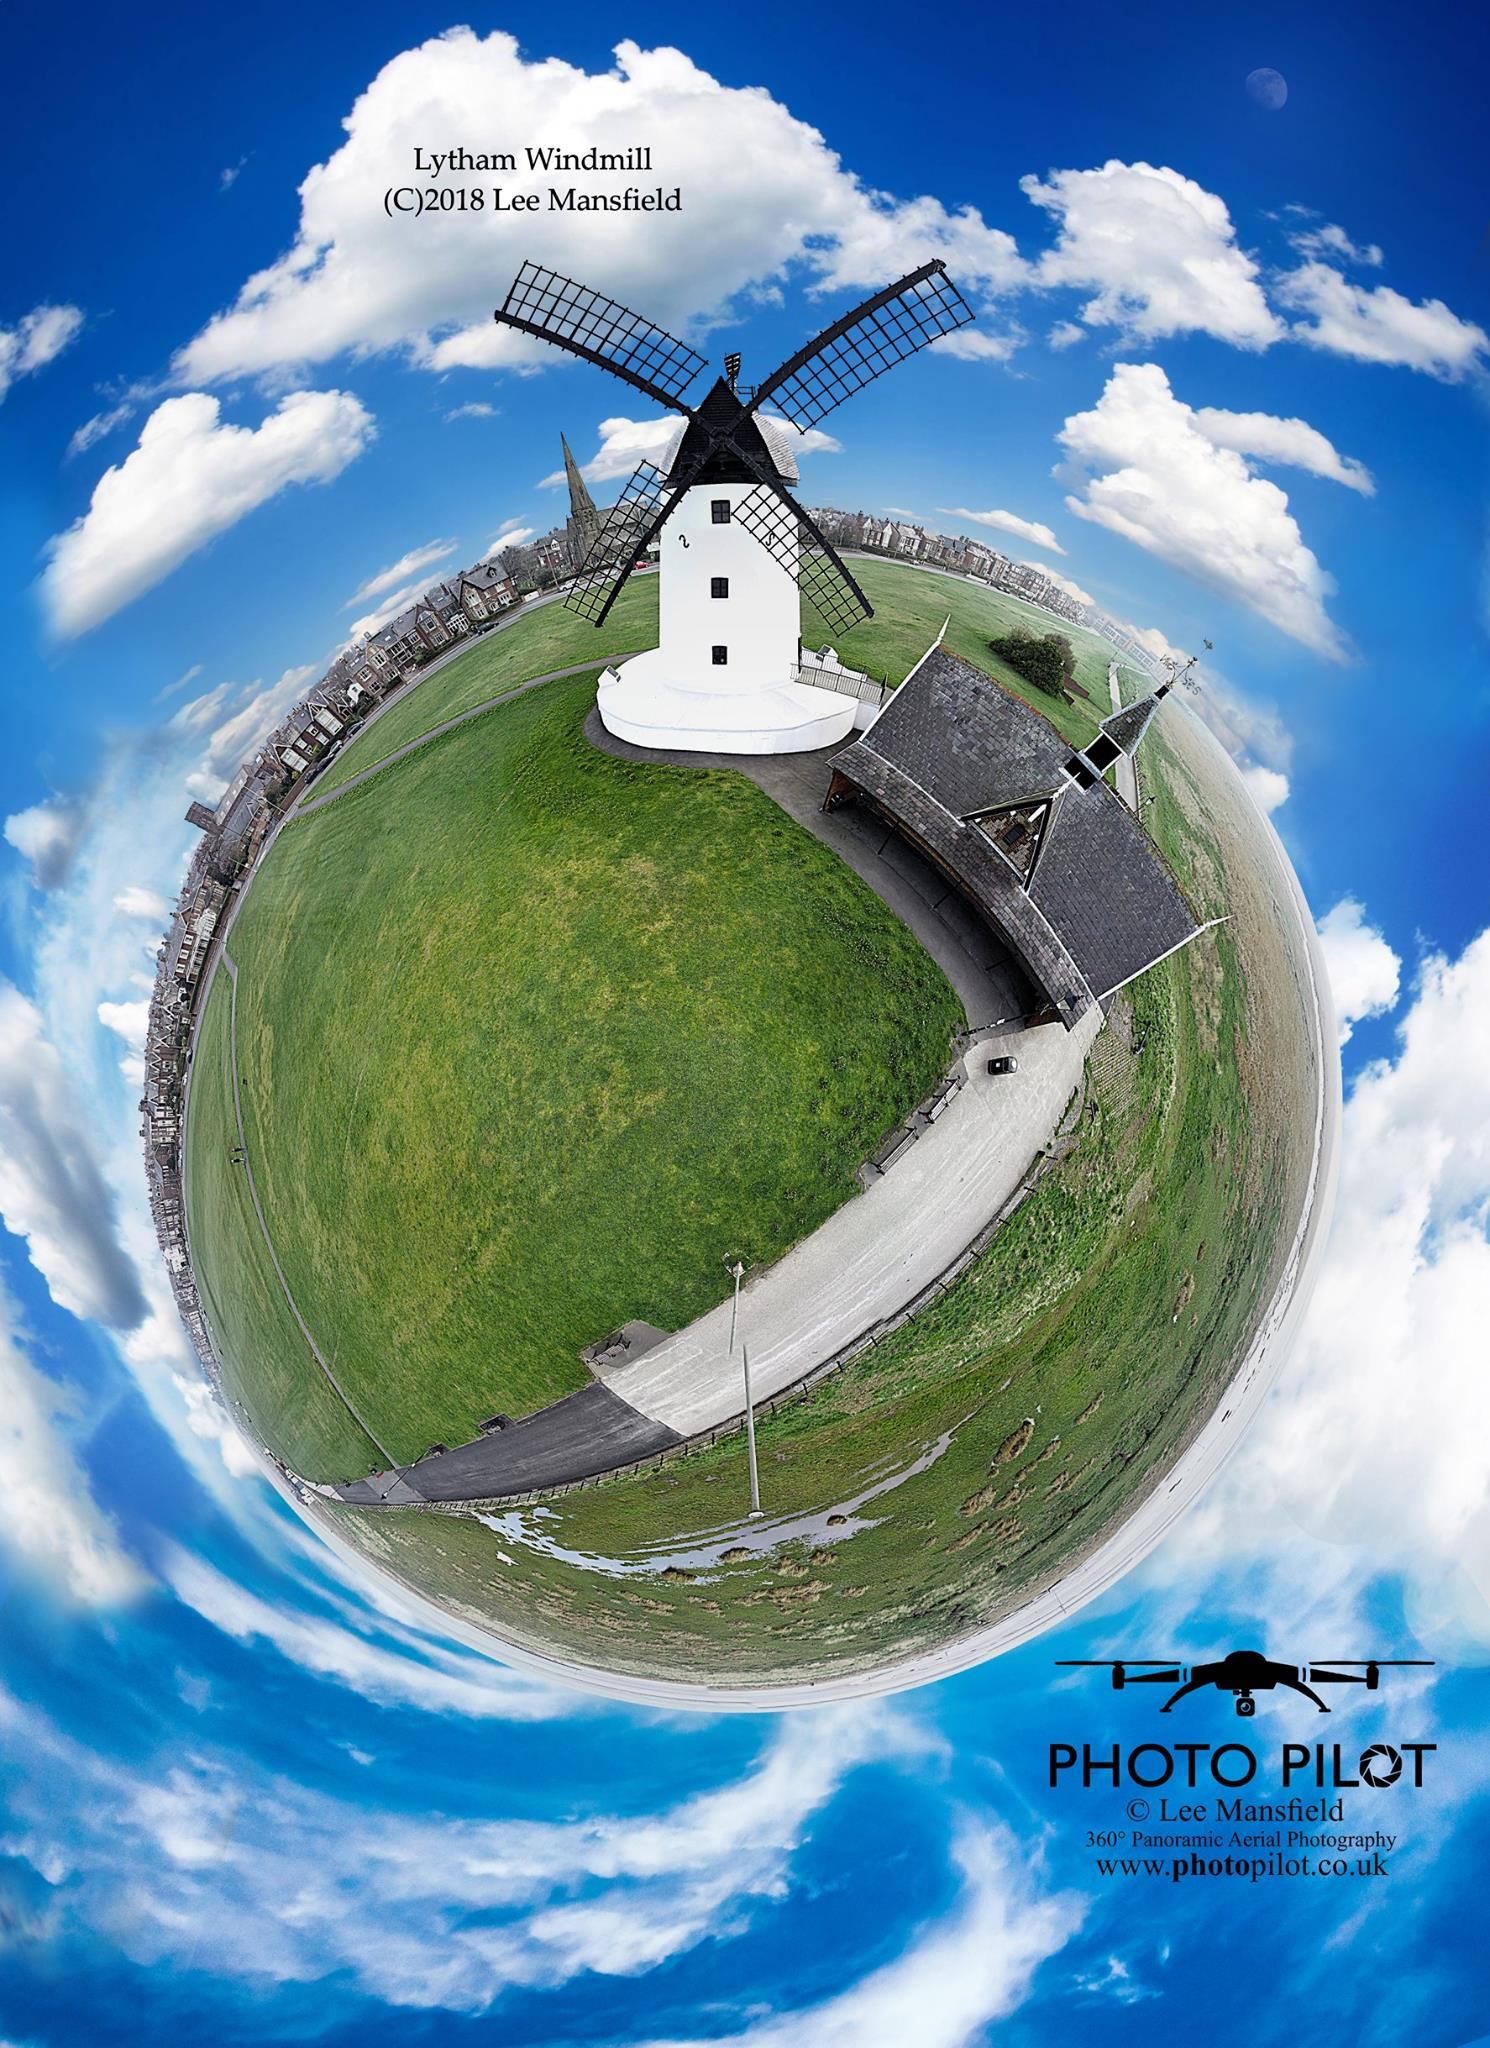 Lytham - Windmill 360